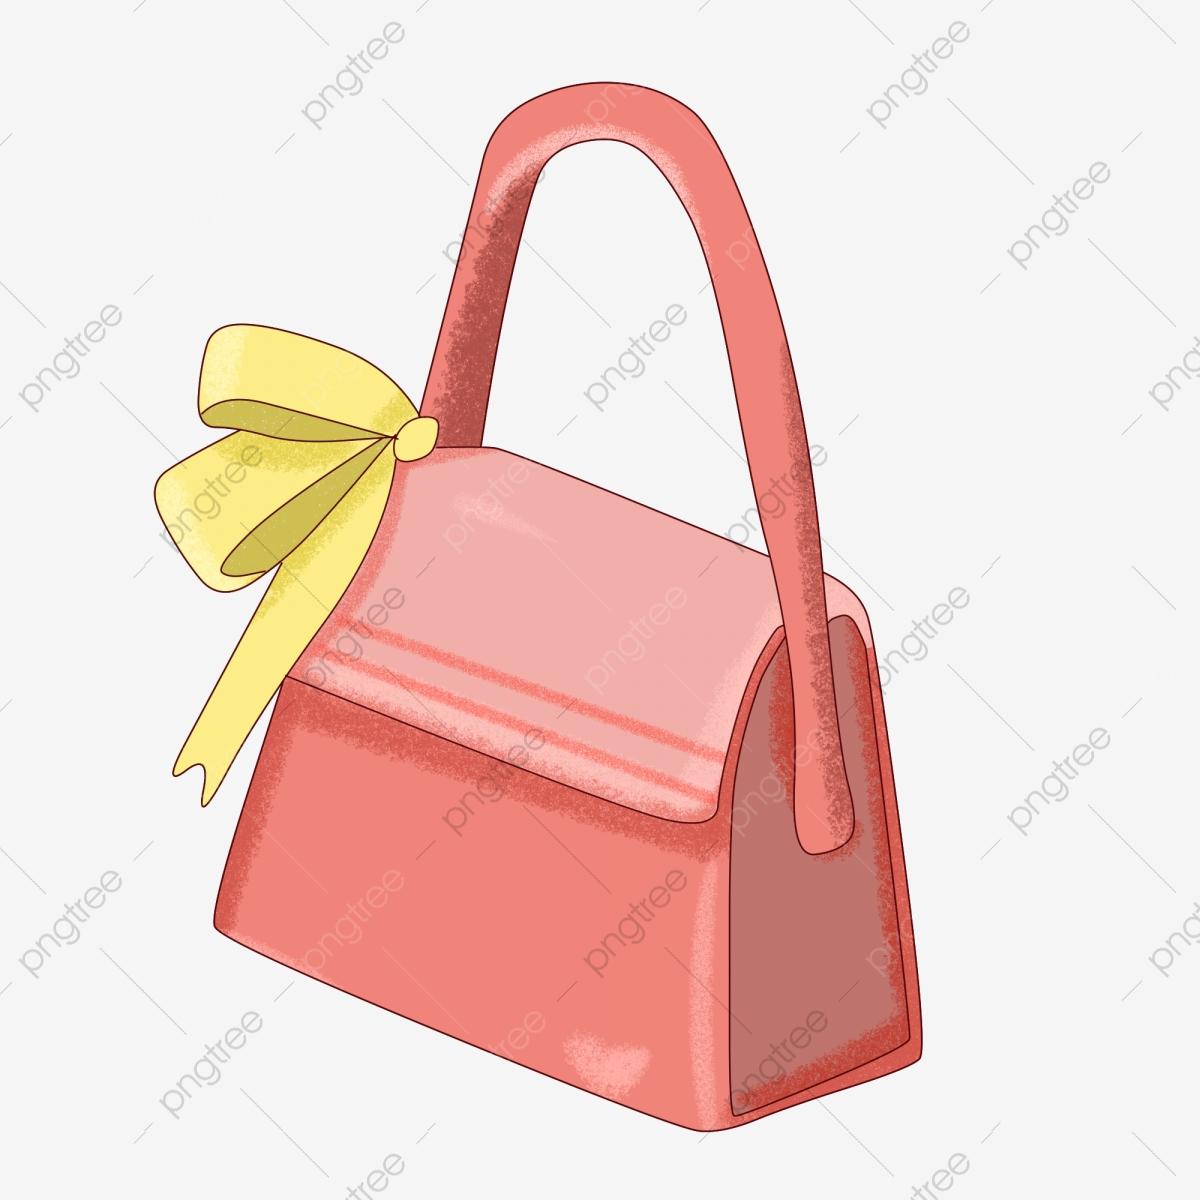 pngtree-handbag-packet-womens-bag-cartoon-bag-png-image_3865840